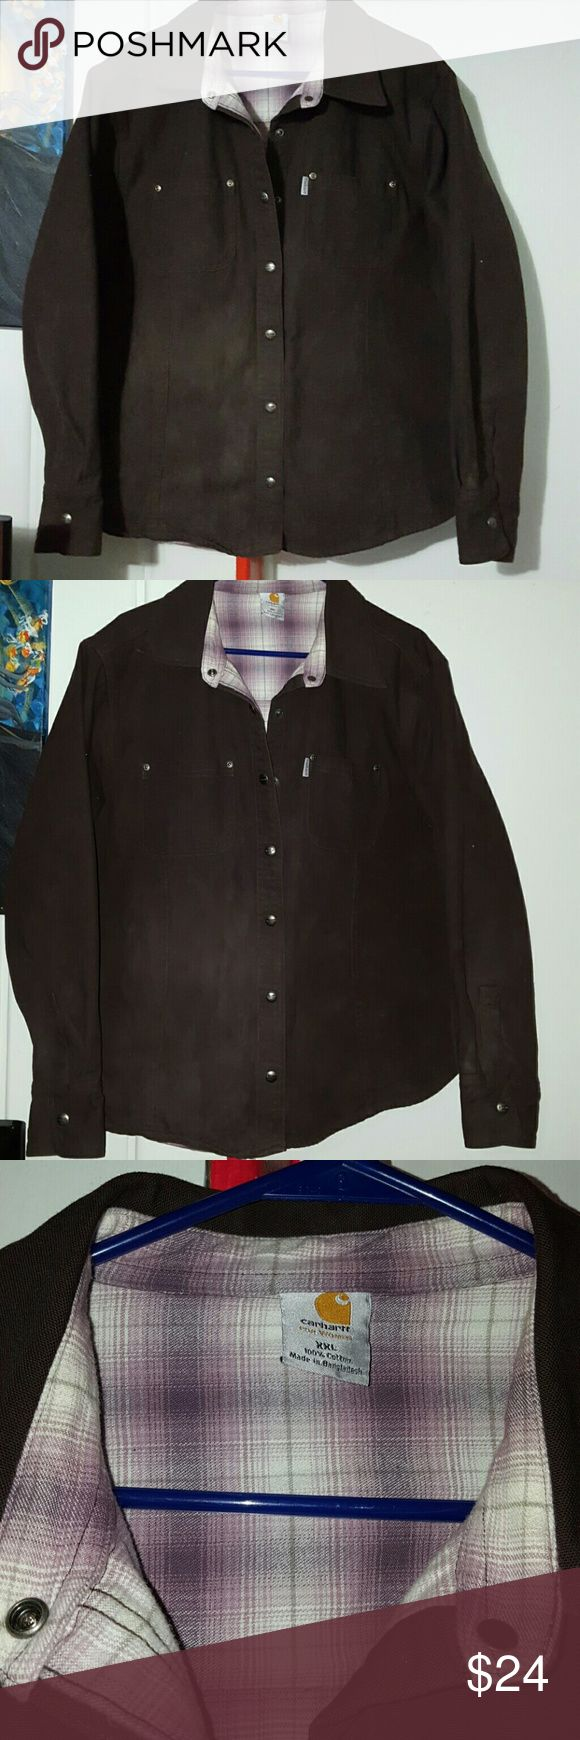 Women's Carhartt heavy work shirt Chocolate brown Carhartt work shirt with purple plaid flannel interior Carhartt Jackets & Coats